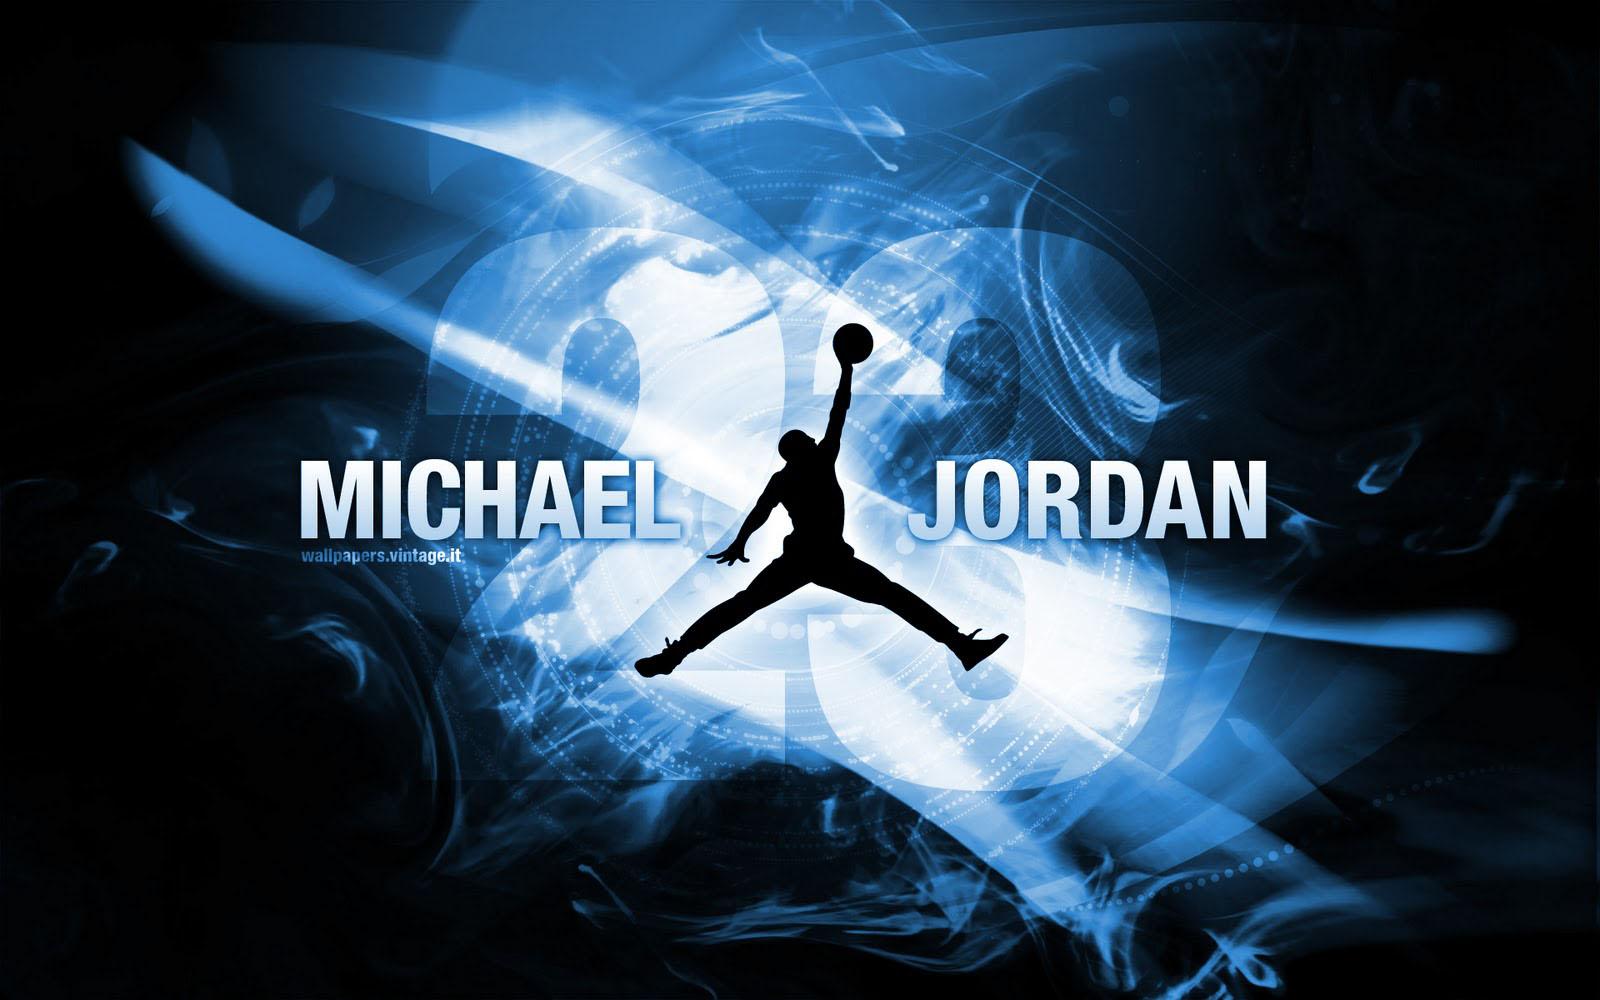 michael jordan by vintage it michael jordan legacy by rowhard415 1600x1000